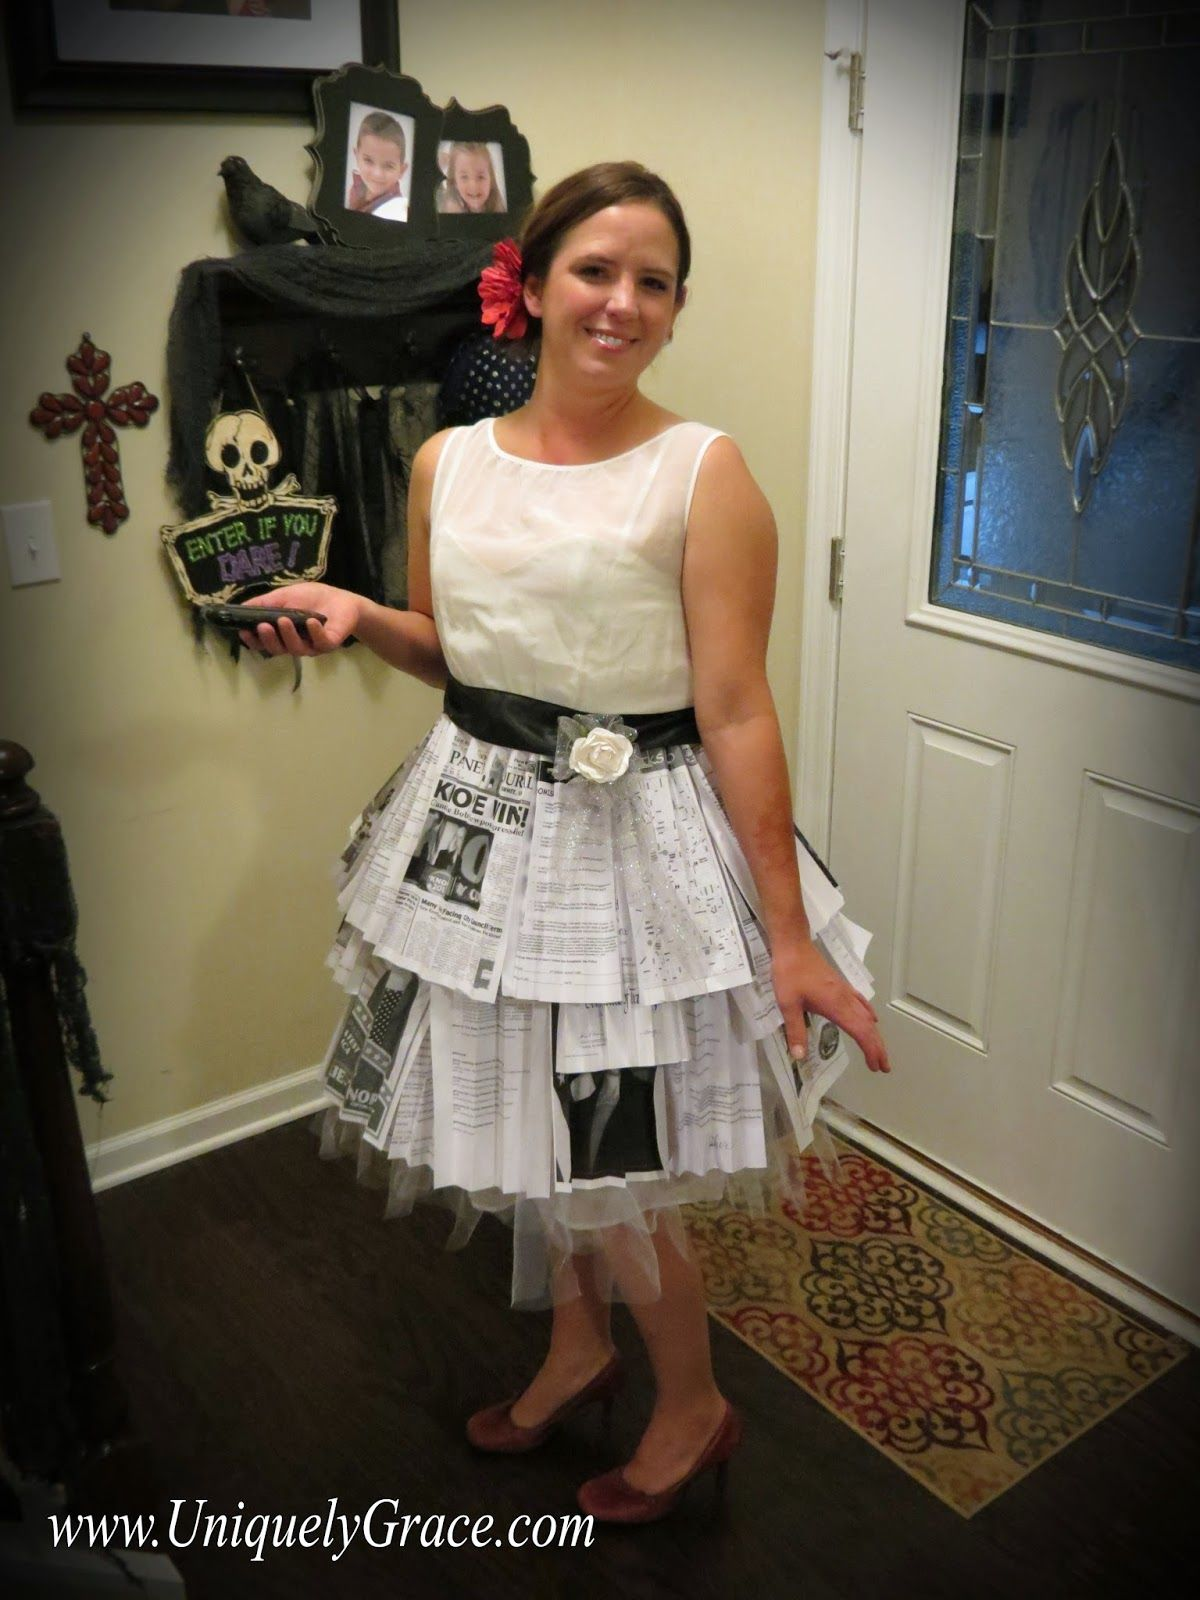 Parks and Recreation Leslie Knopeus Wedding Dress Costume Tutorial